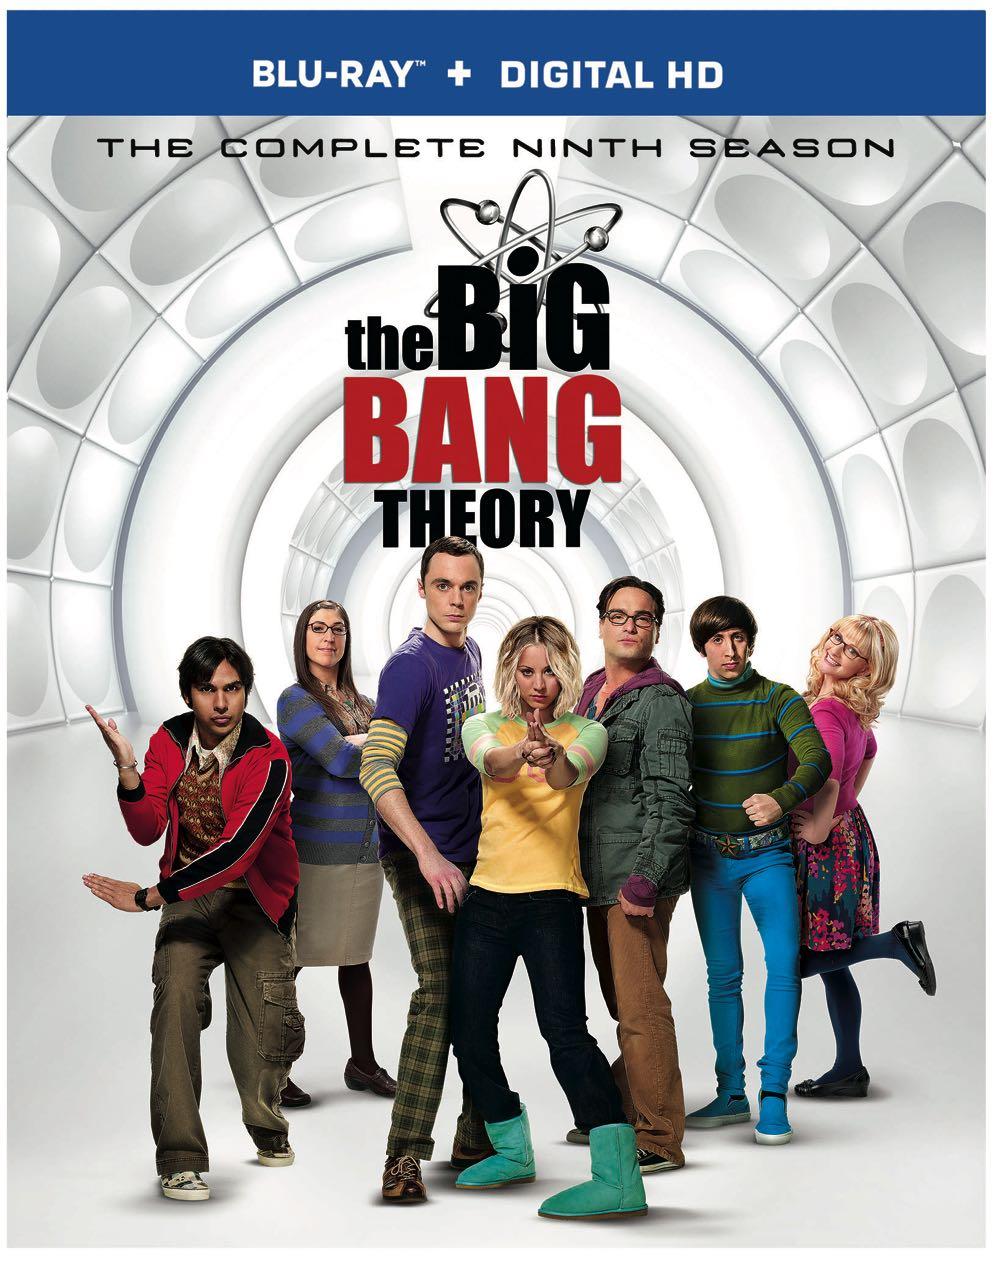 The-Big-Bang-Theory-Season-9-Bluray.jpg